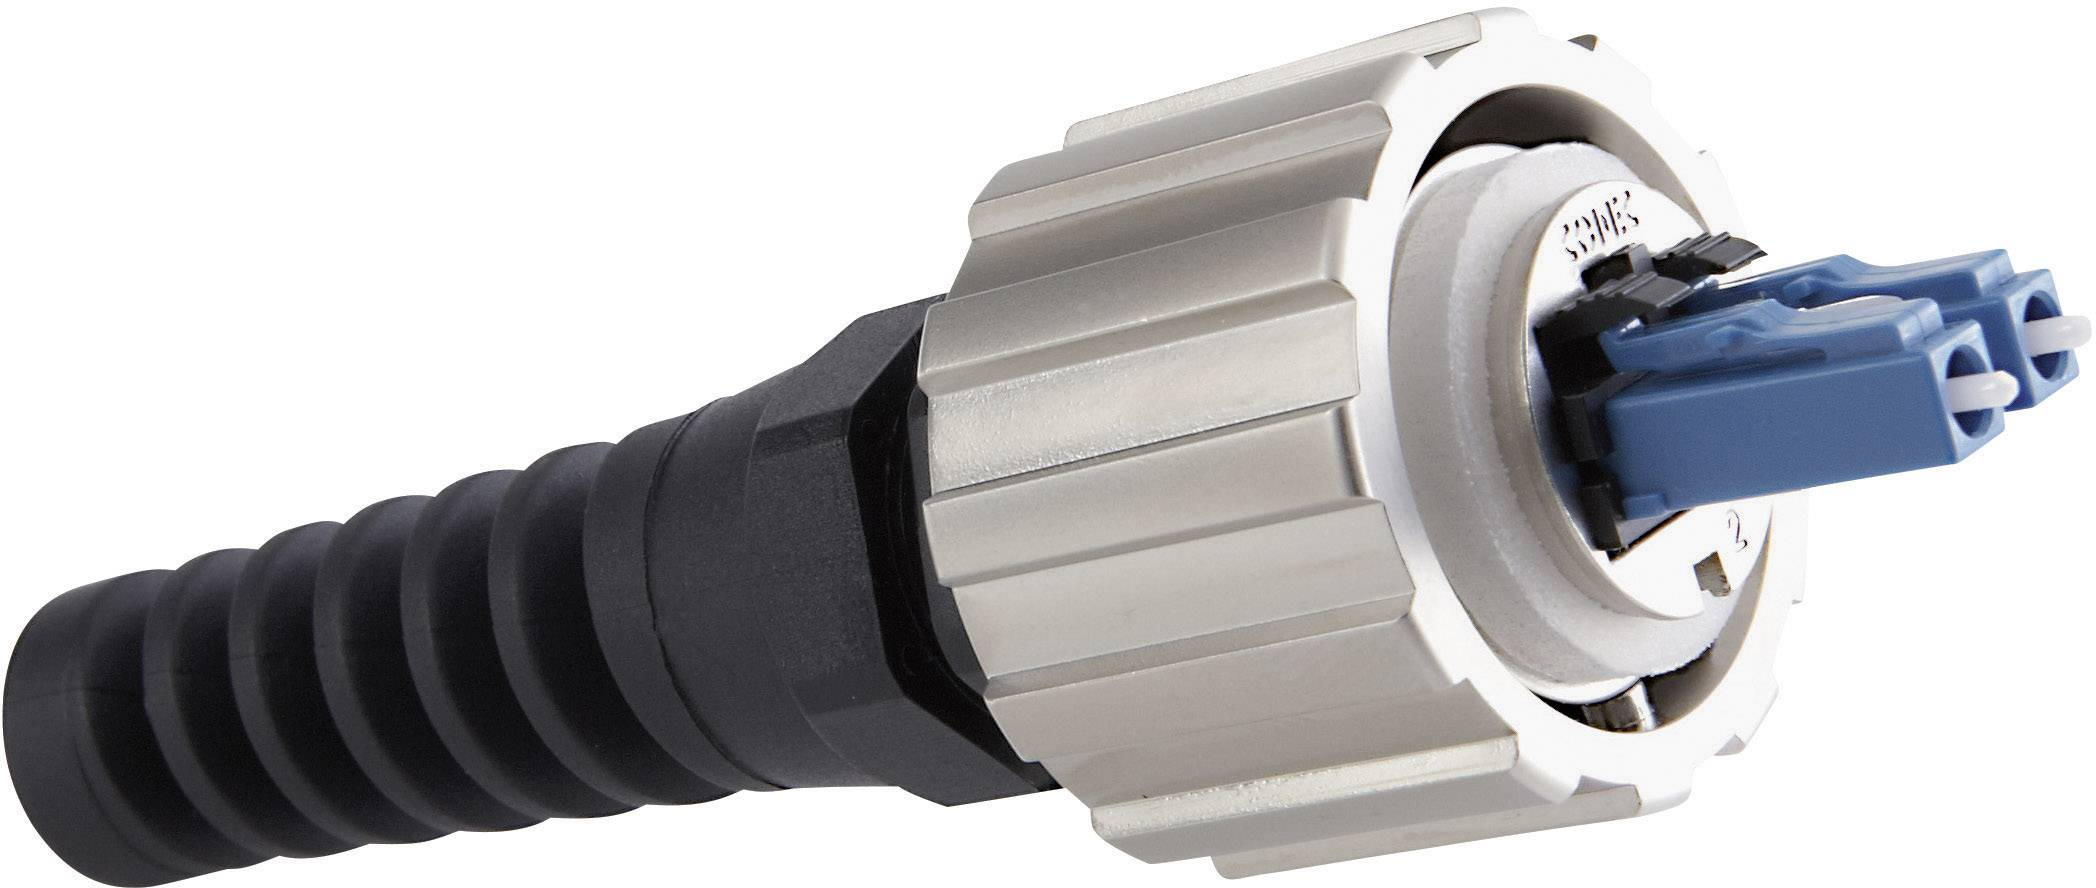 Konektor optických vláken IP67 Conec, 17-300040